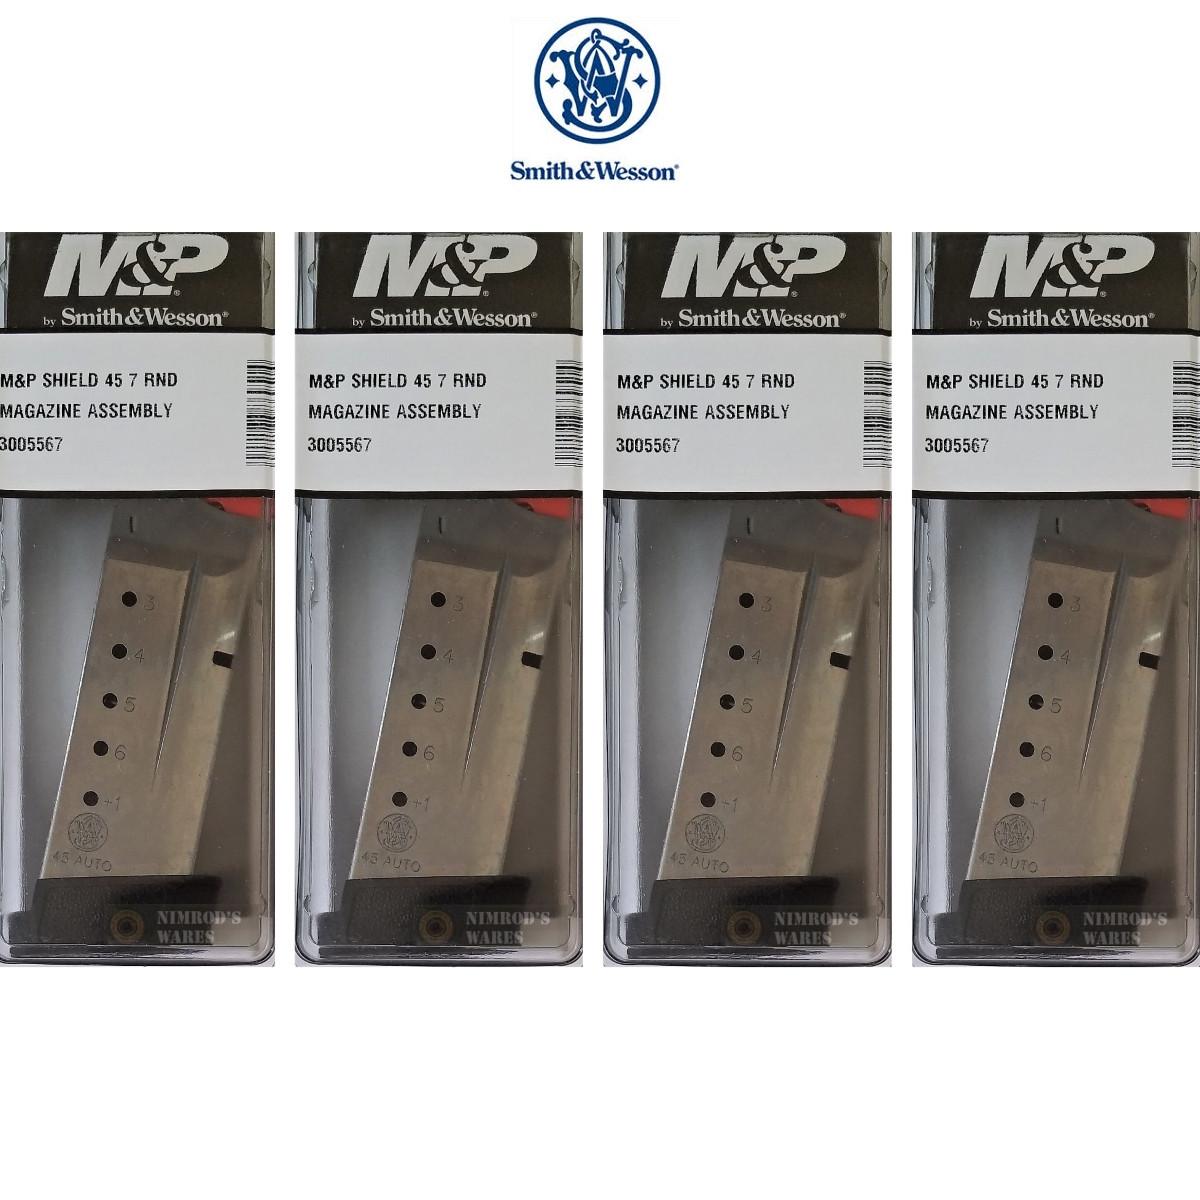 S&W Smith & Wesson M&P 45 SHIELD  45 ACP 7 Round MAGAZINE 4-PACK 3005567